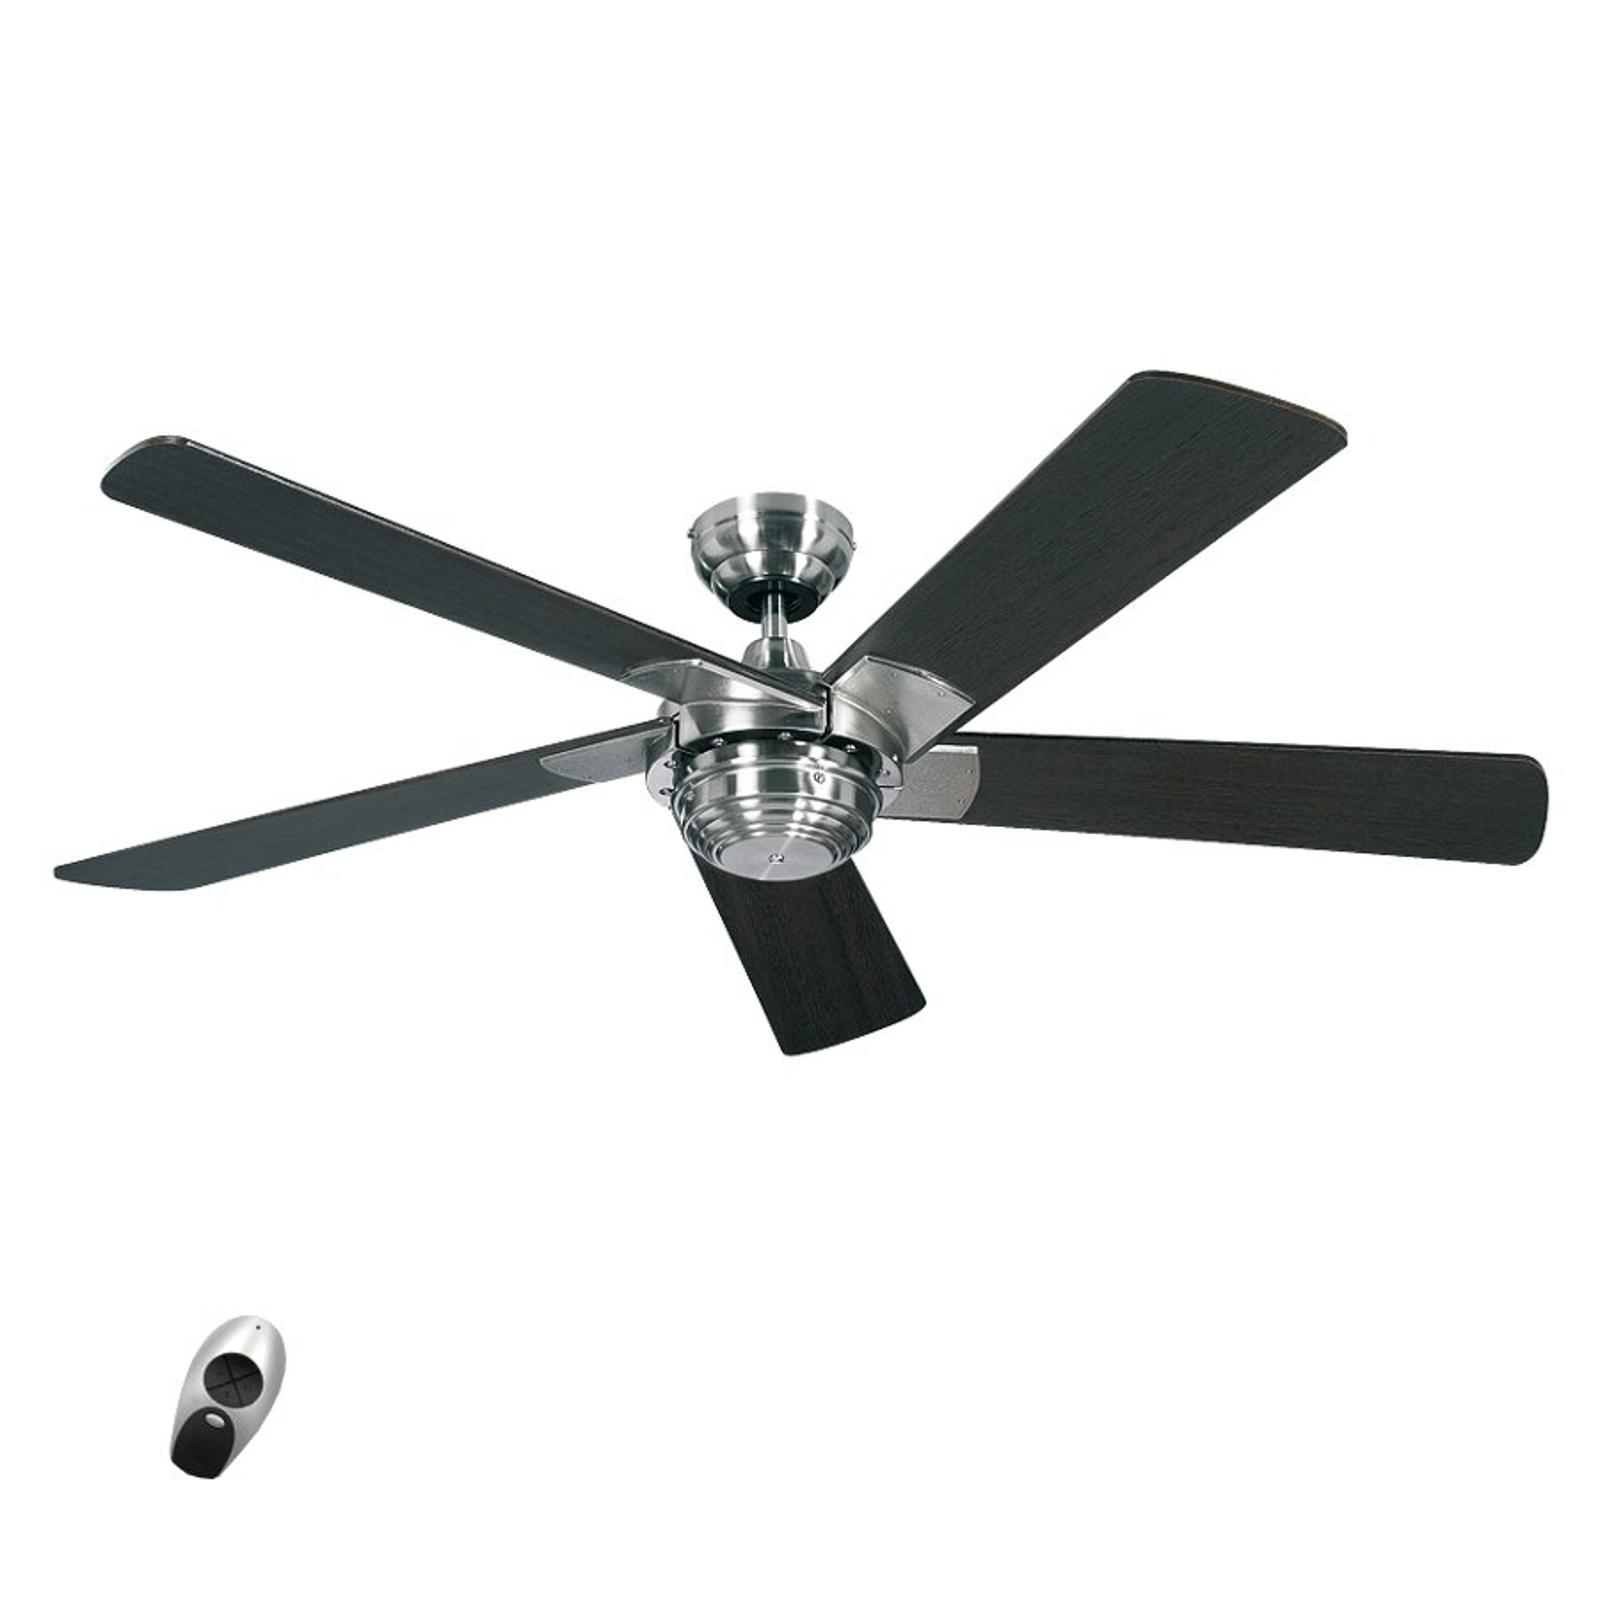 Classic modern ceiling fan Rotation_2015010_1